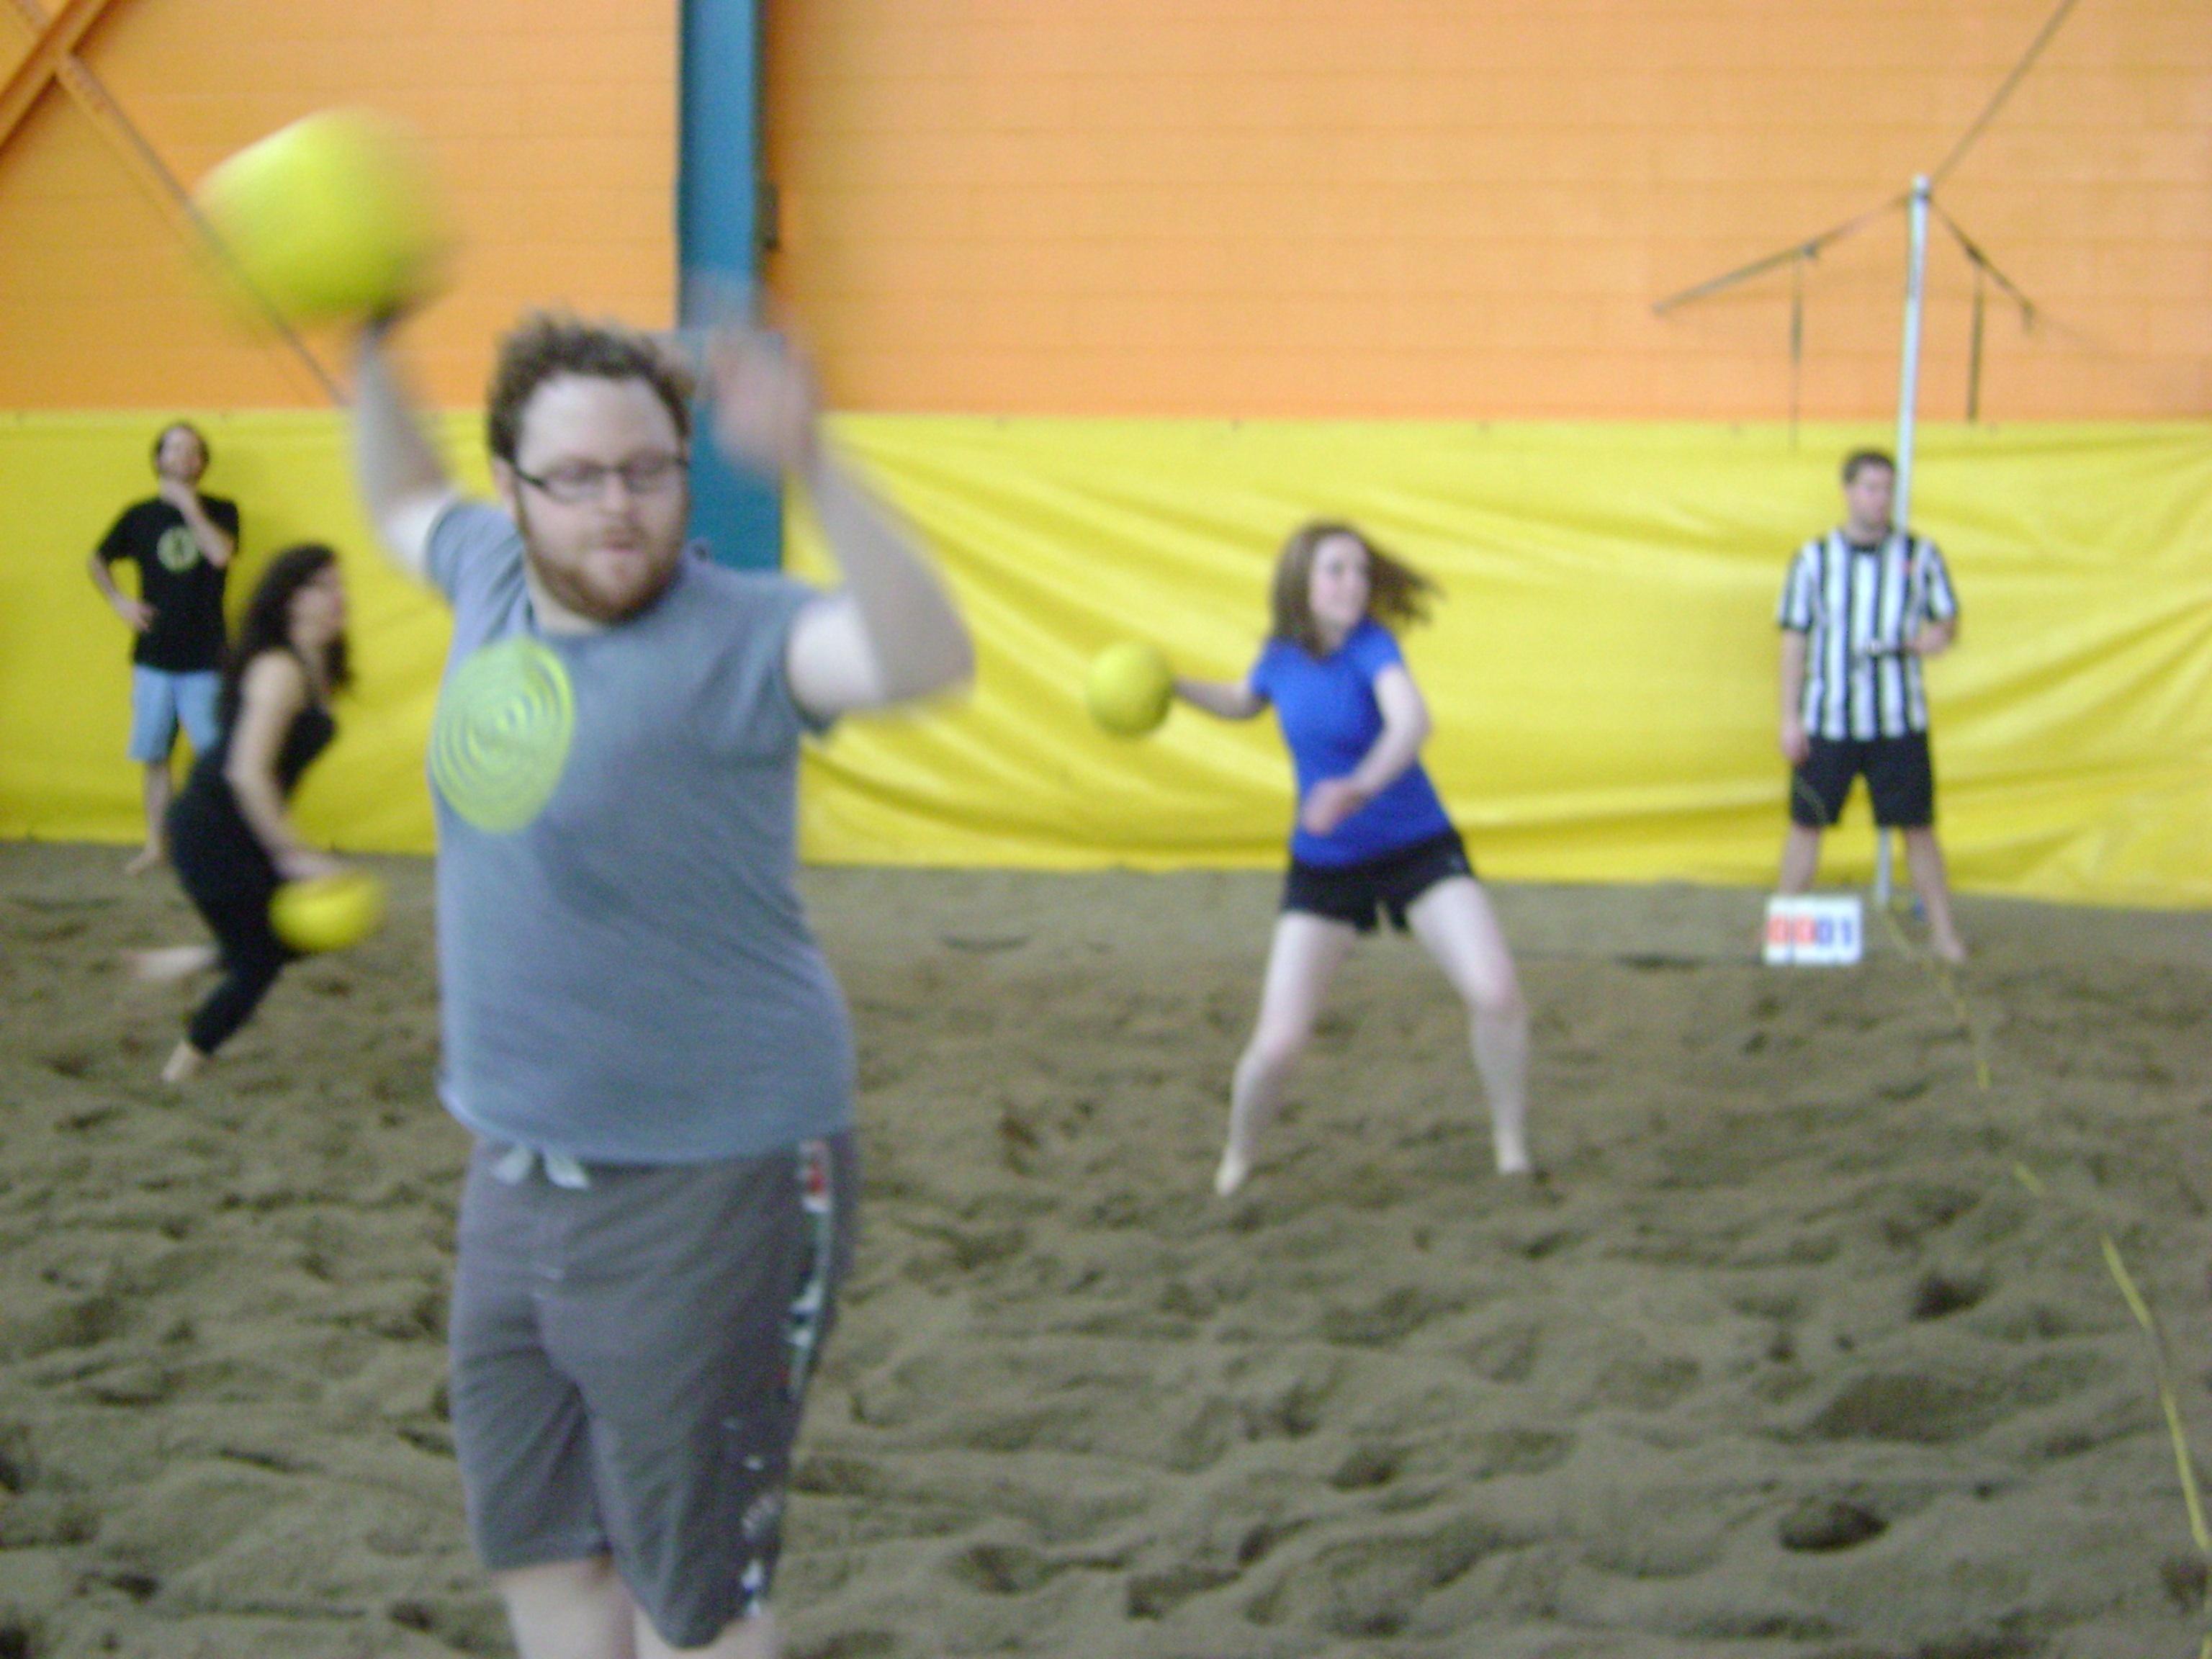 art of dodgeball